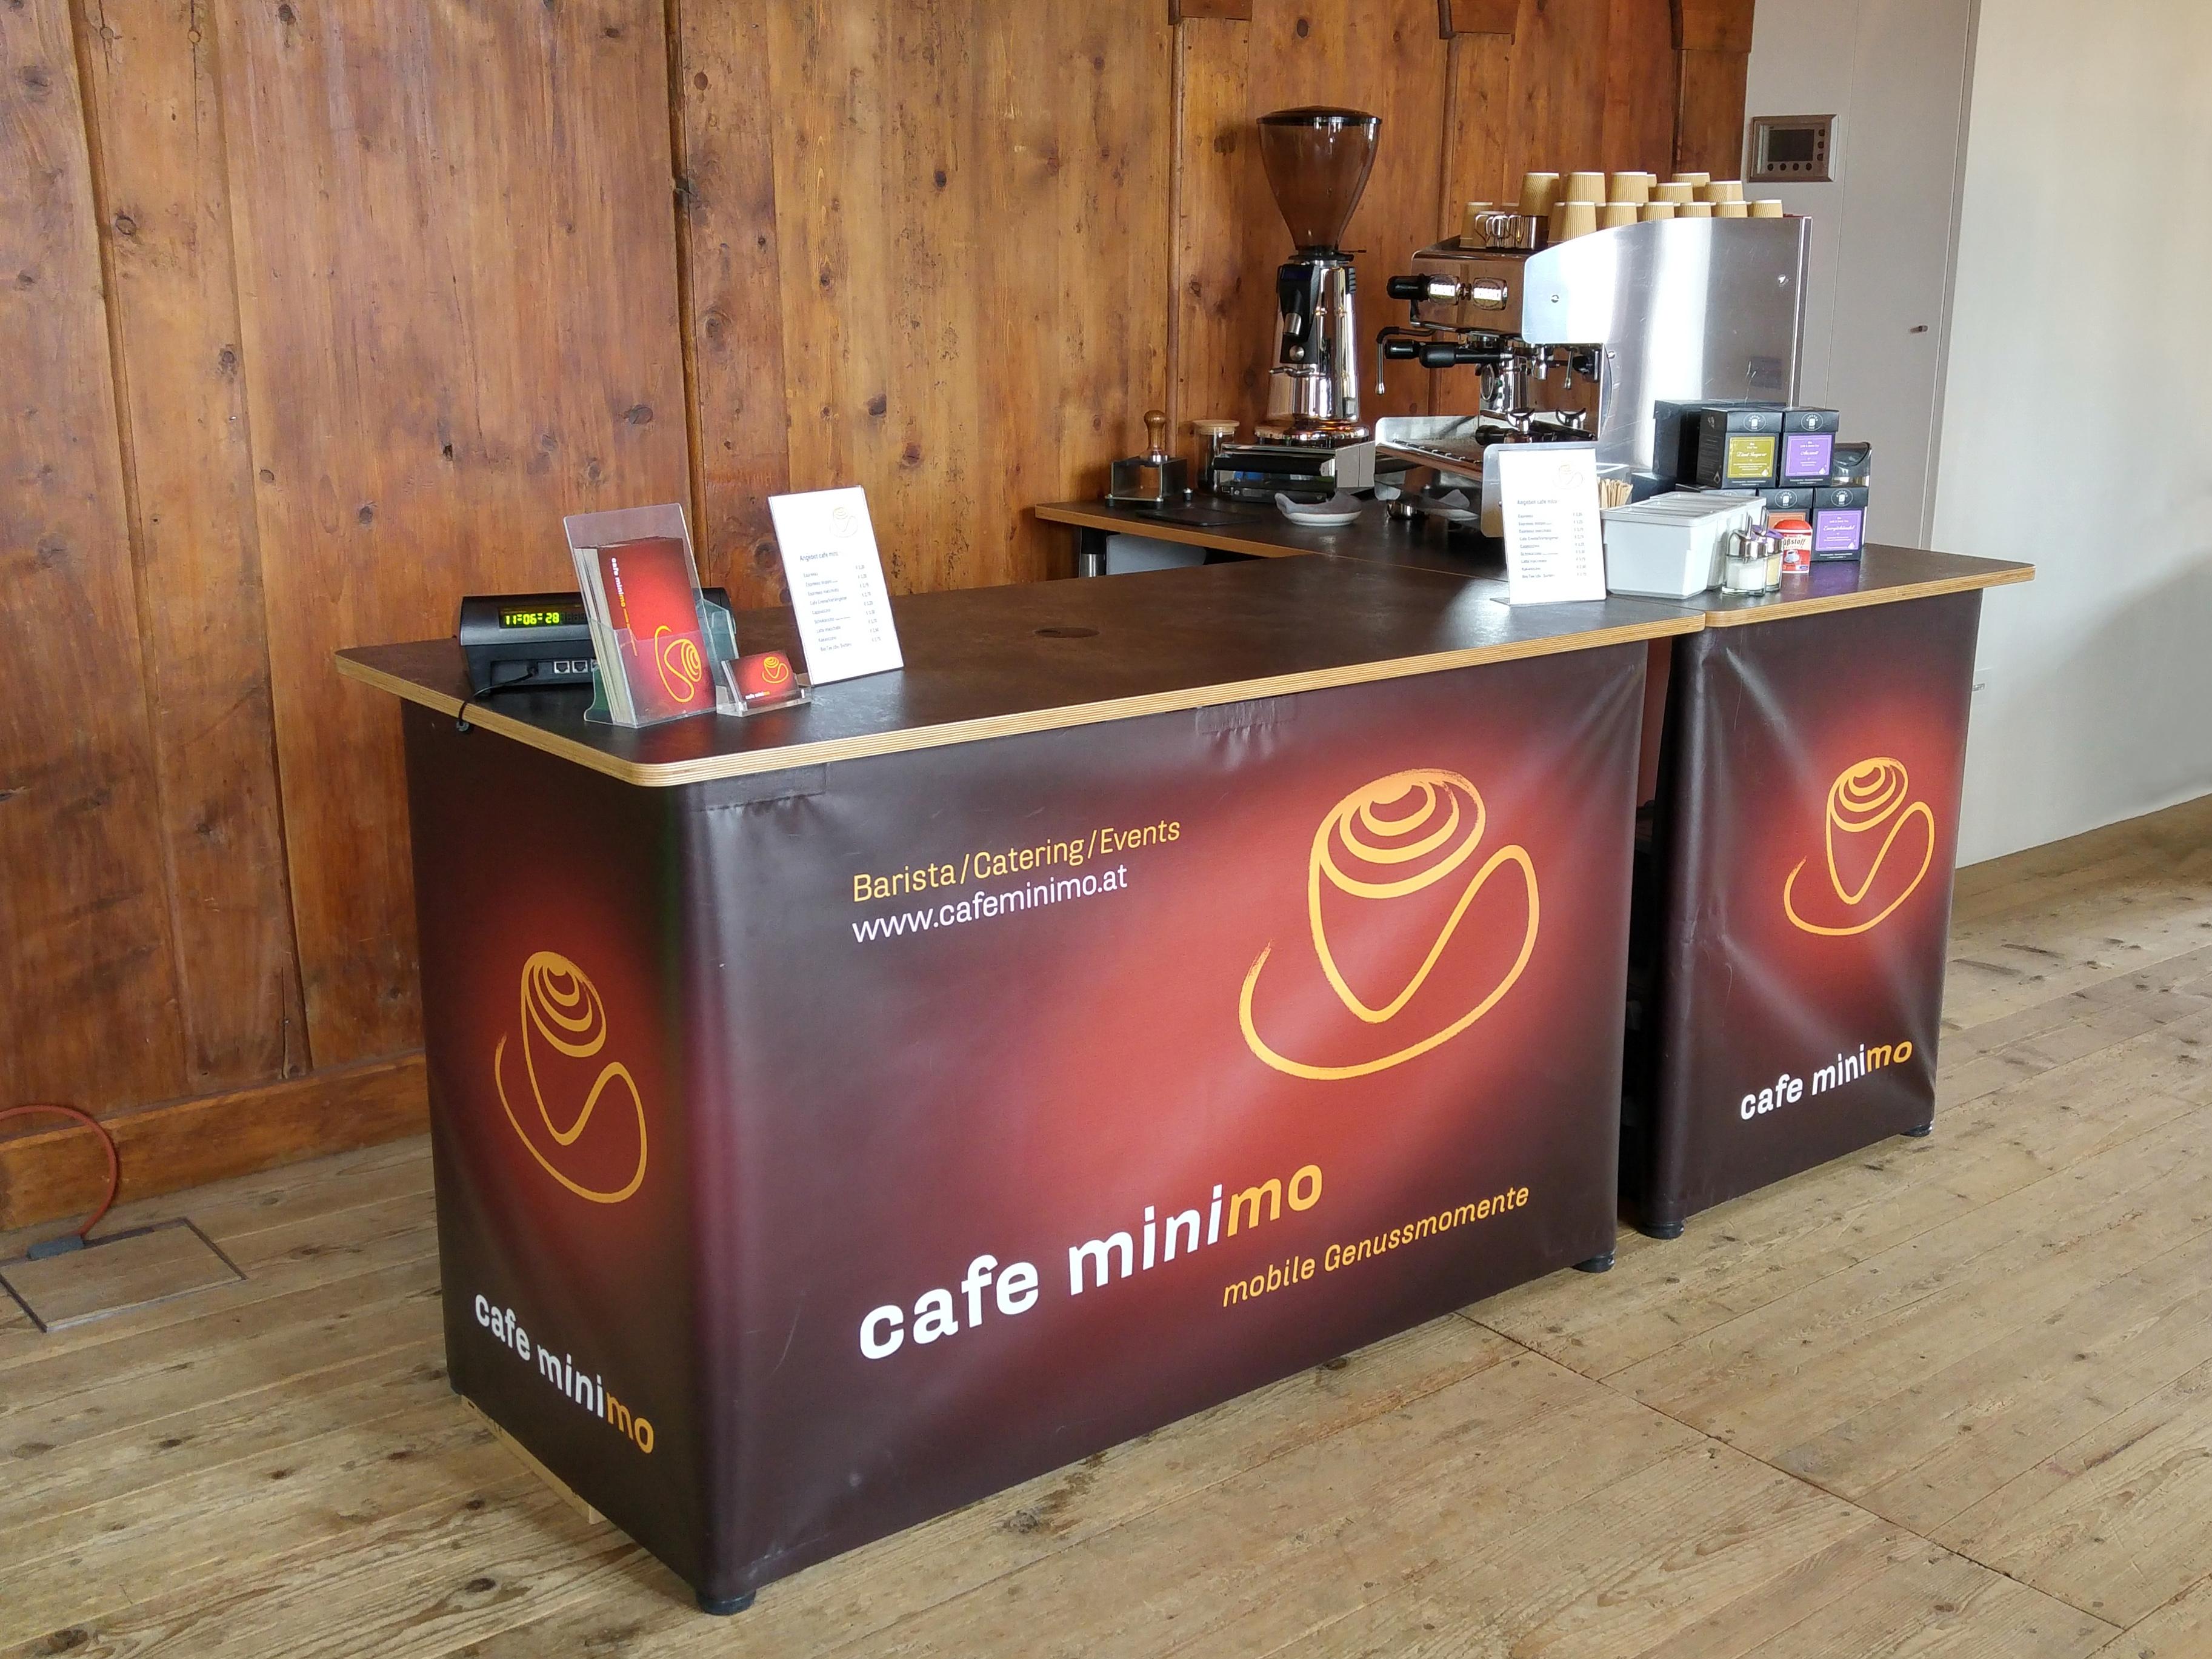 cafe minimo | Die mobile Kaffee-Bar